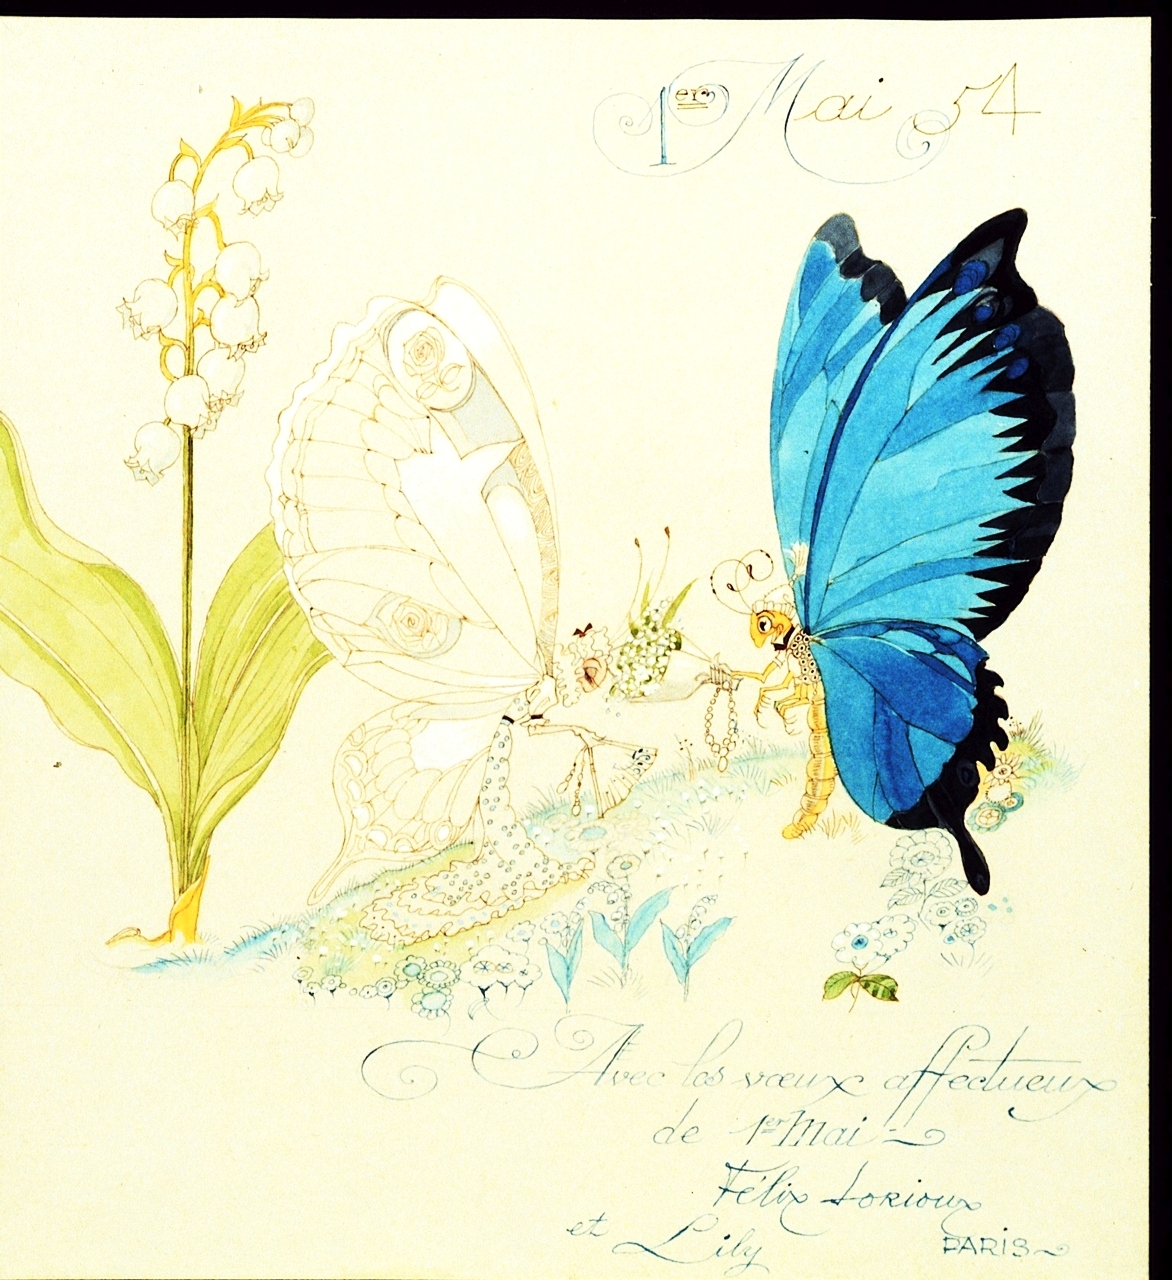 A card from FélixLorioux to his patron Huguette Clark. (EmptyMansionsBook.com.)